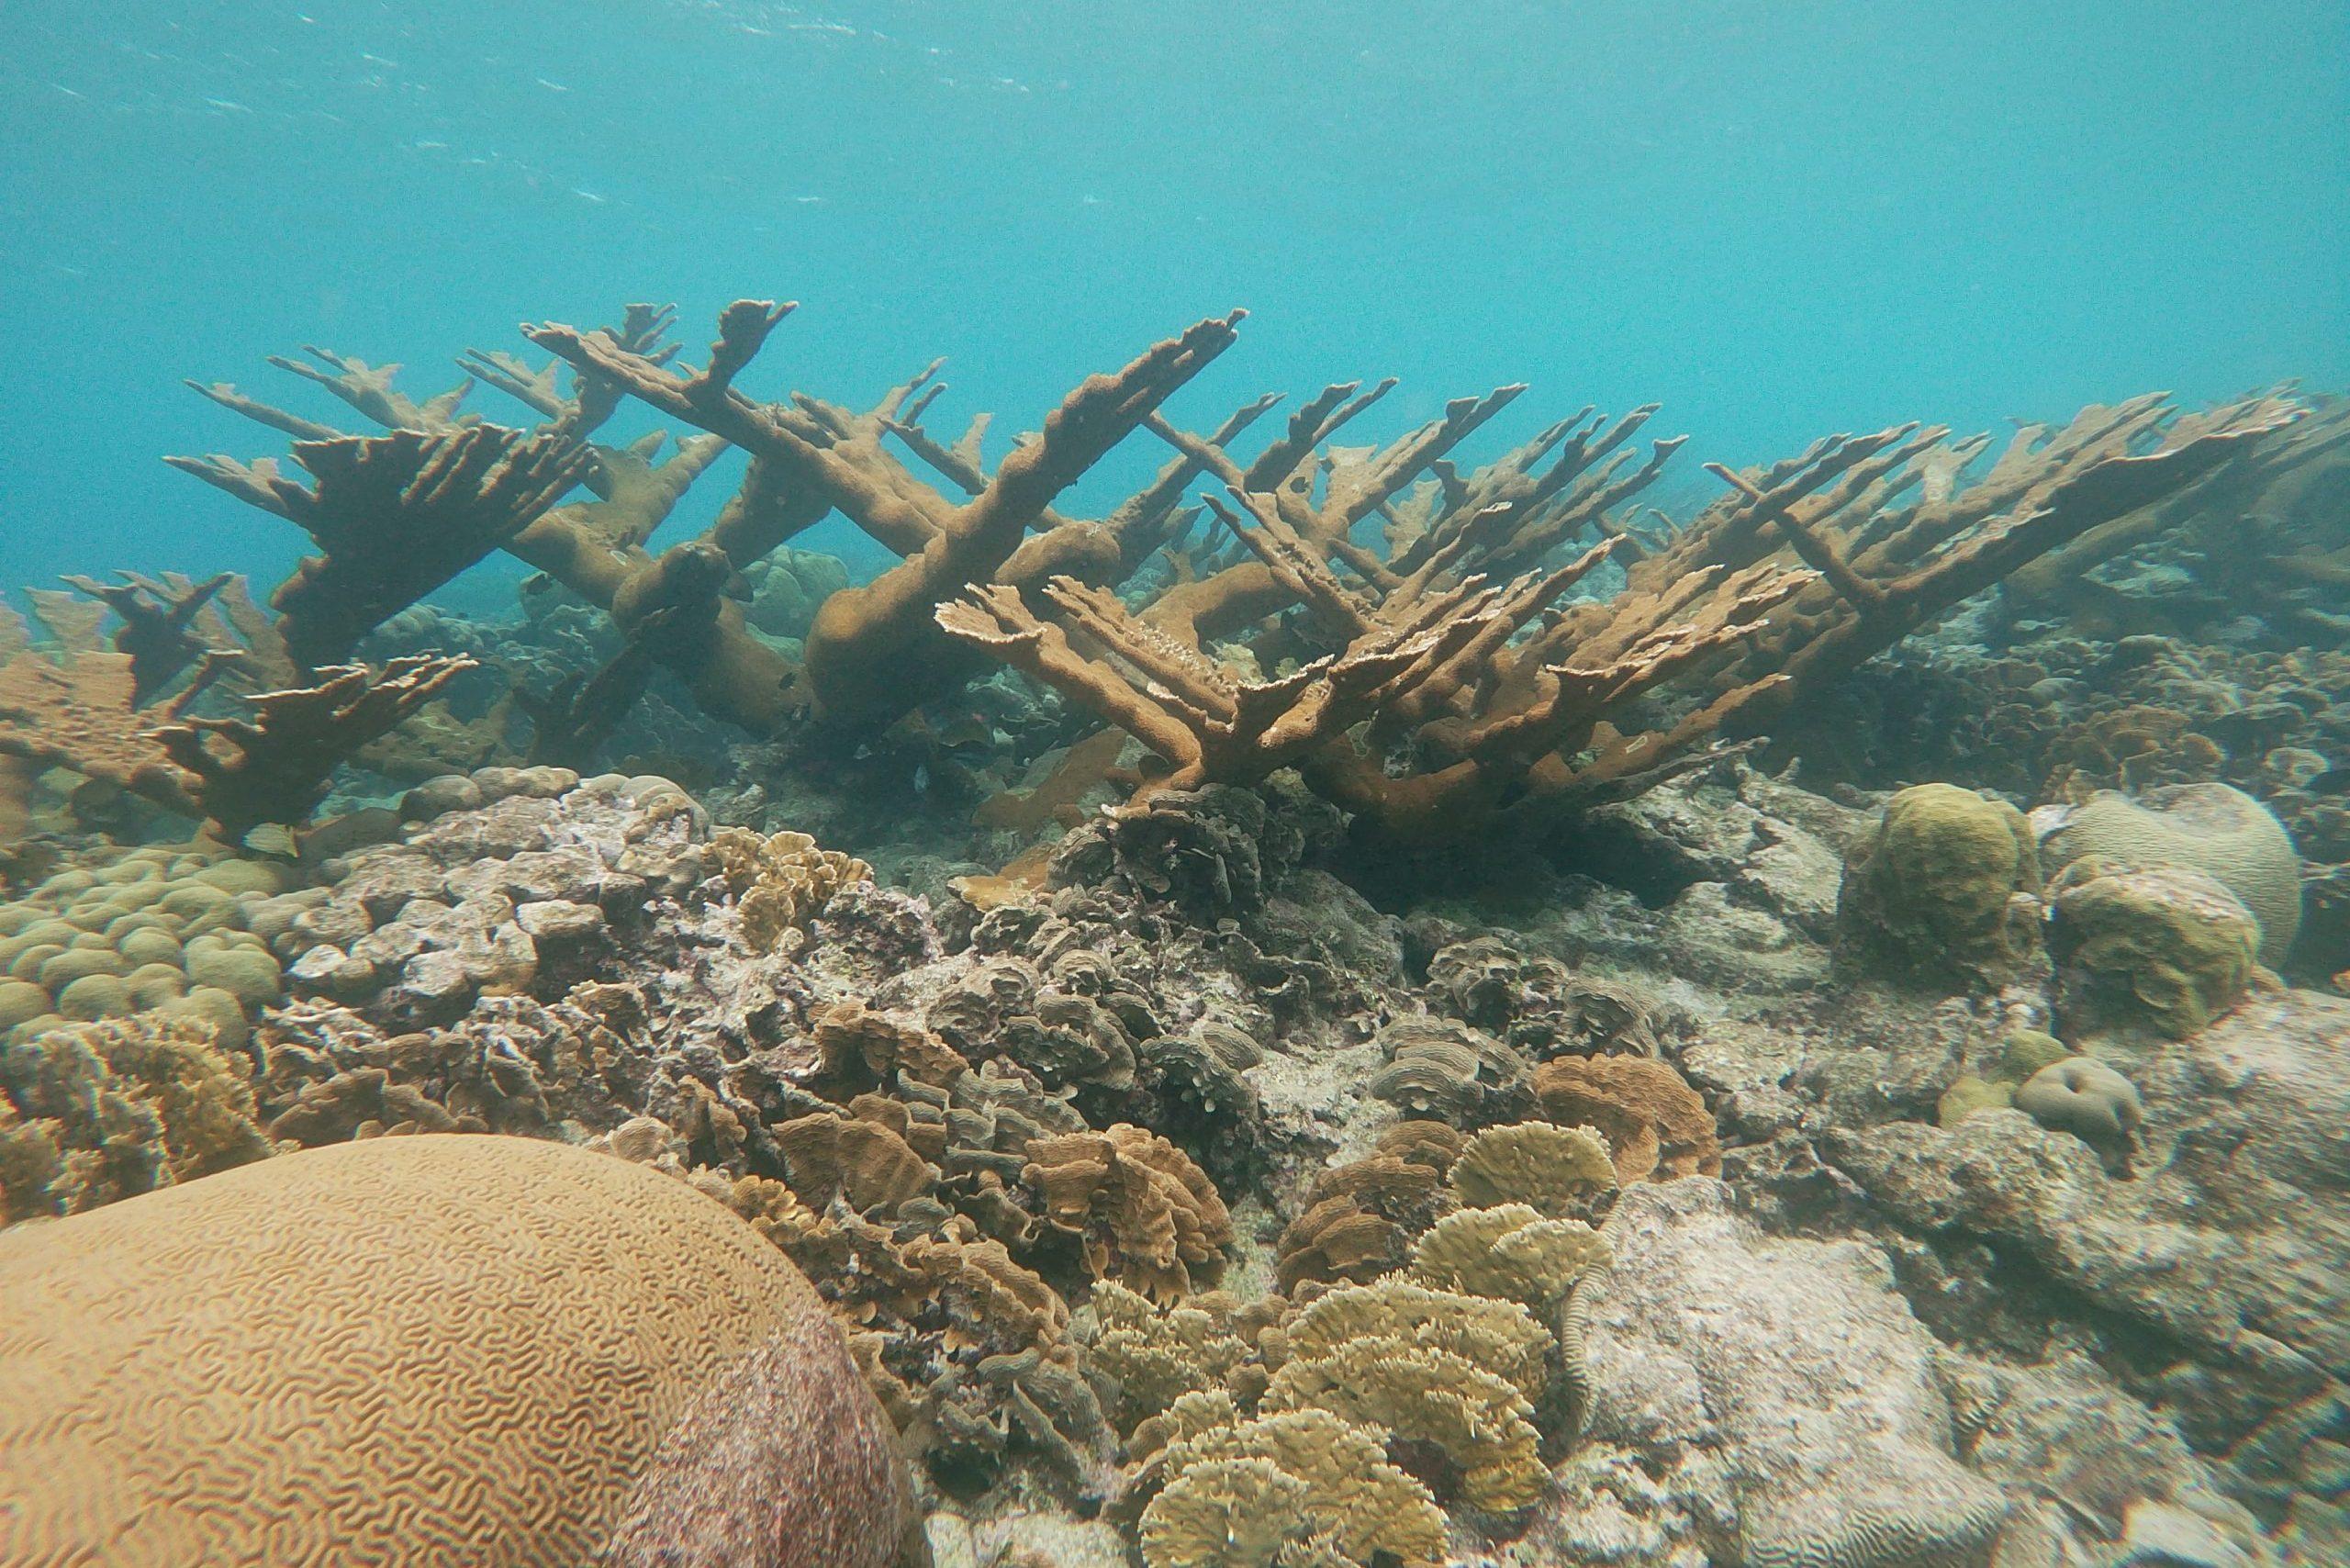 Mangel Halto reef